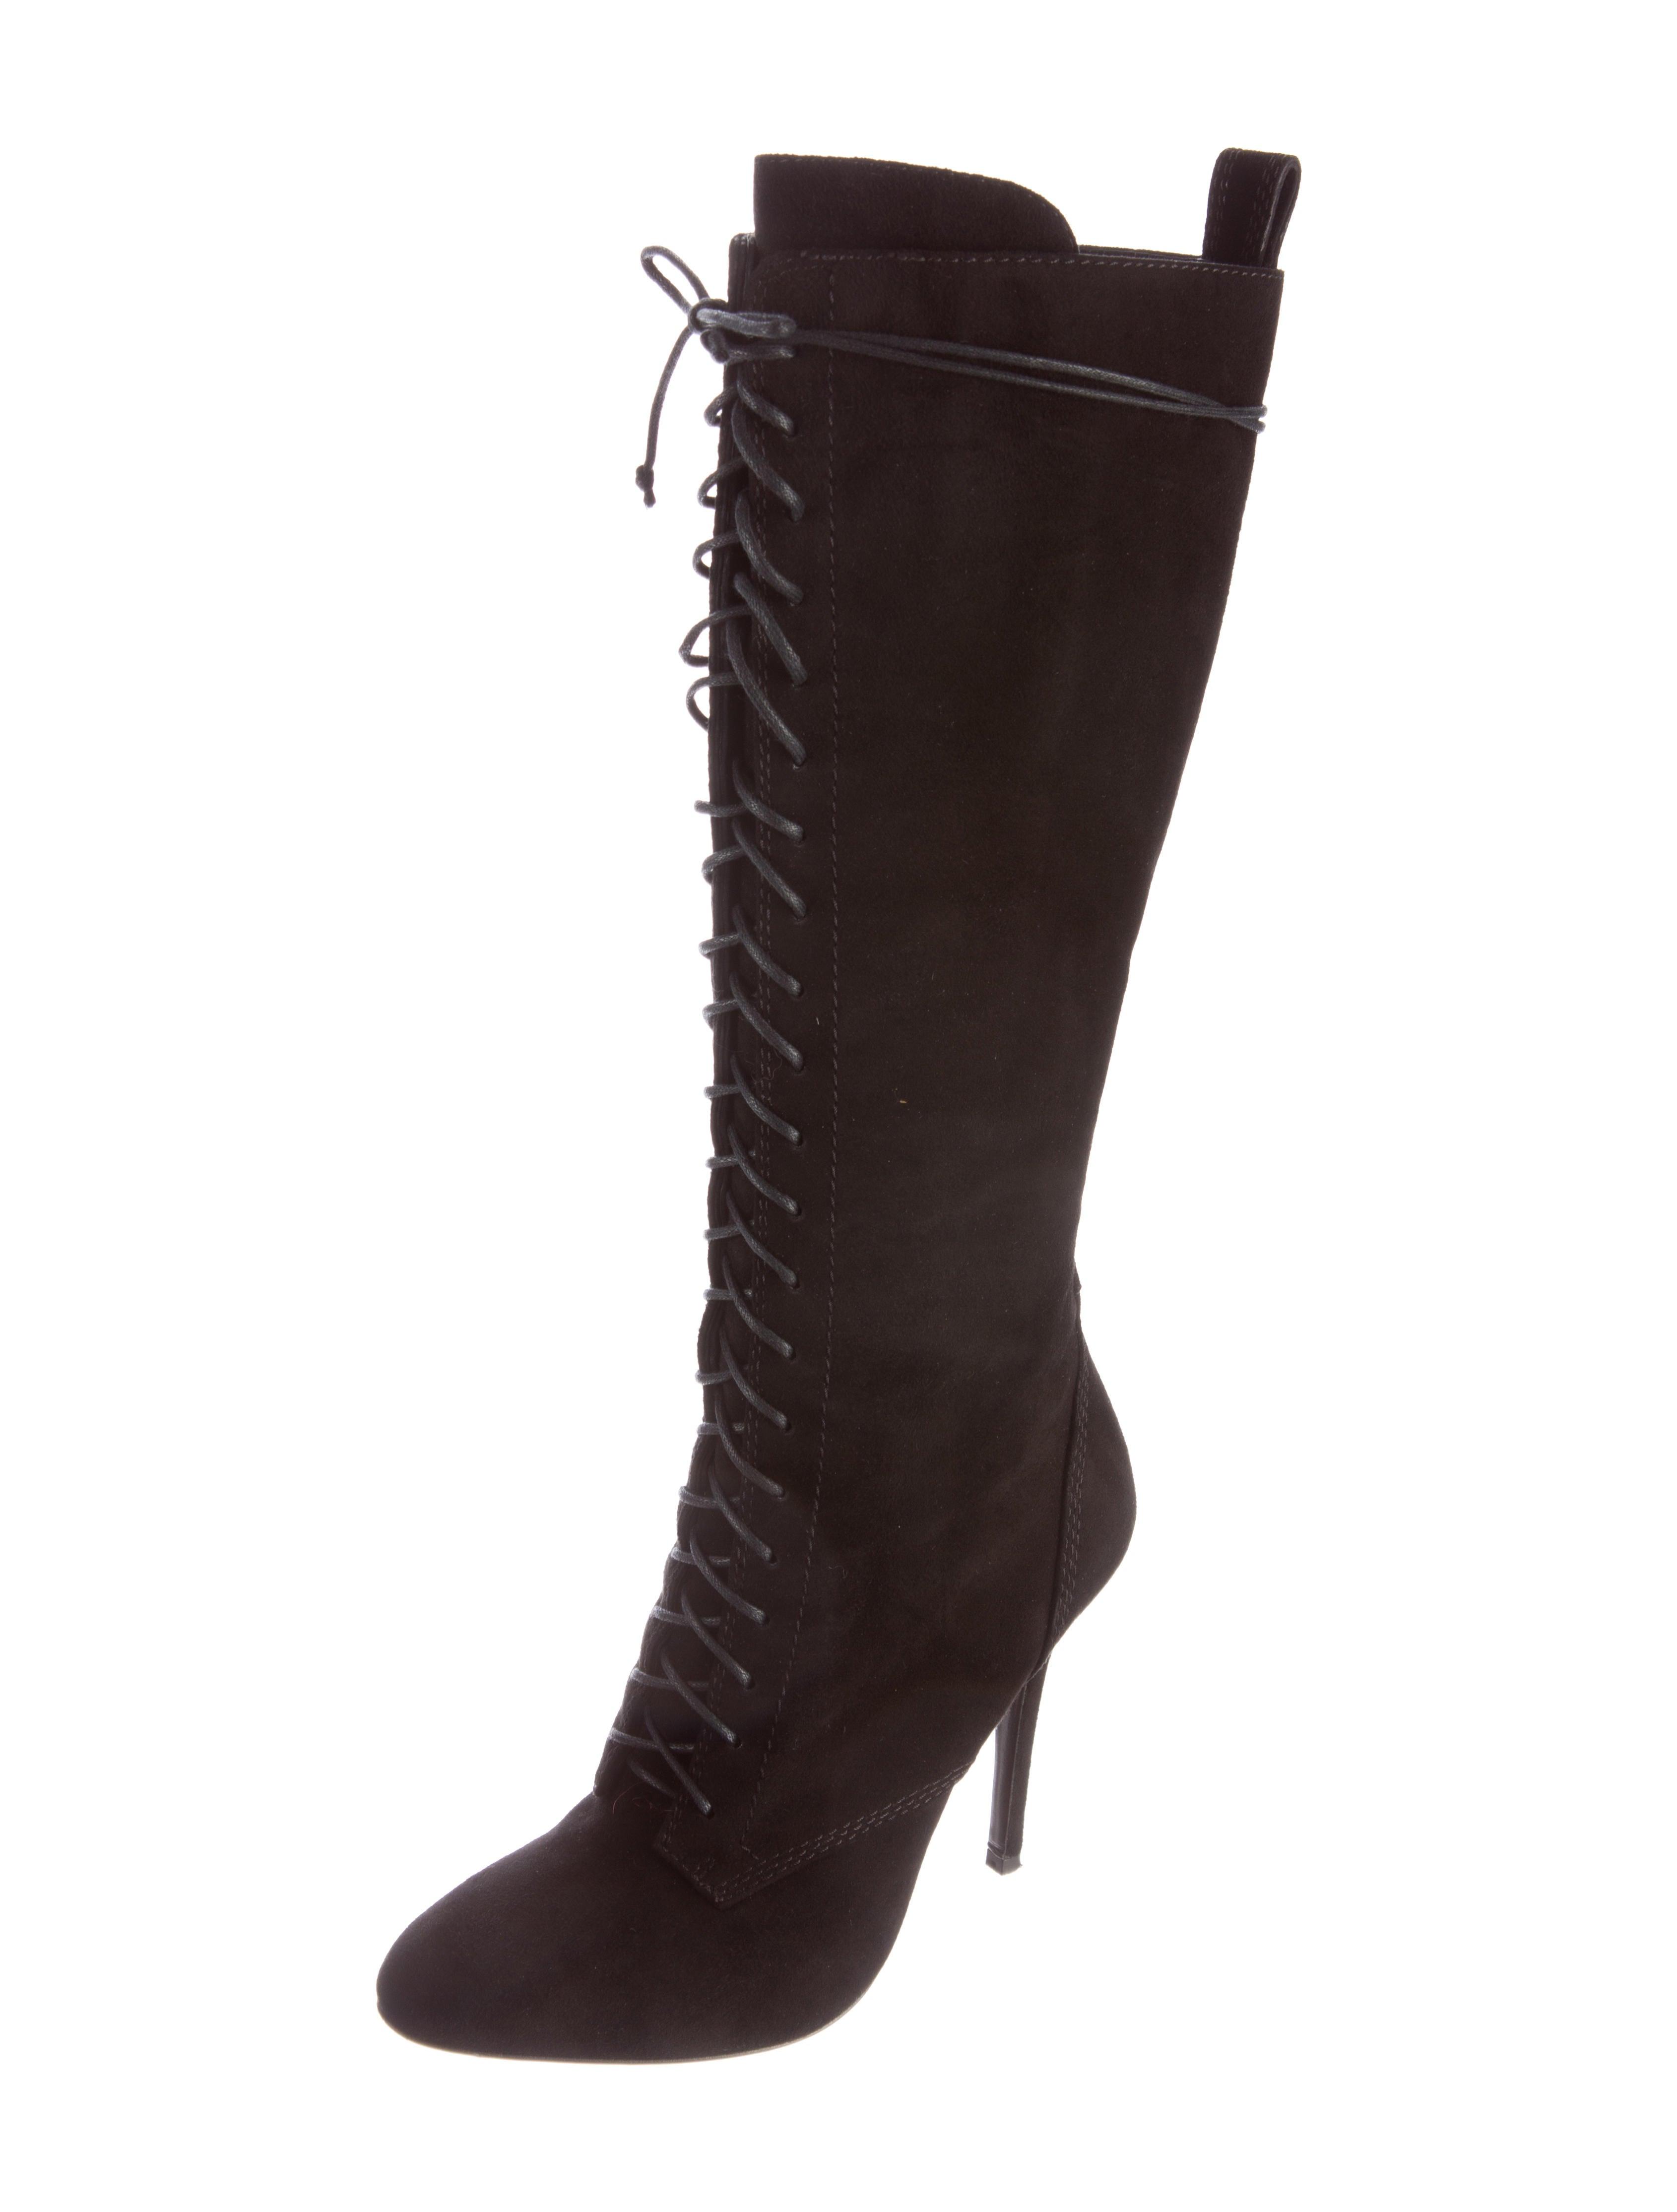 Innovative Balmain Fall/Winter 2014 Women Shoes